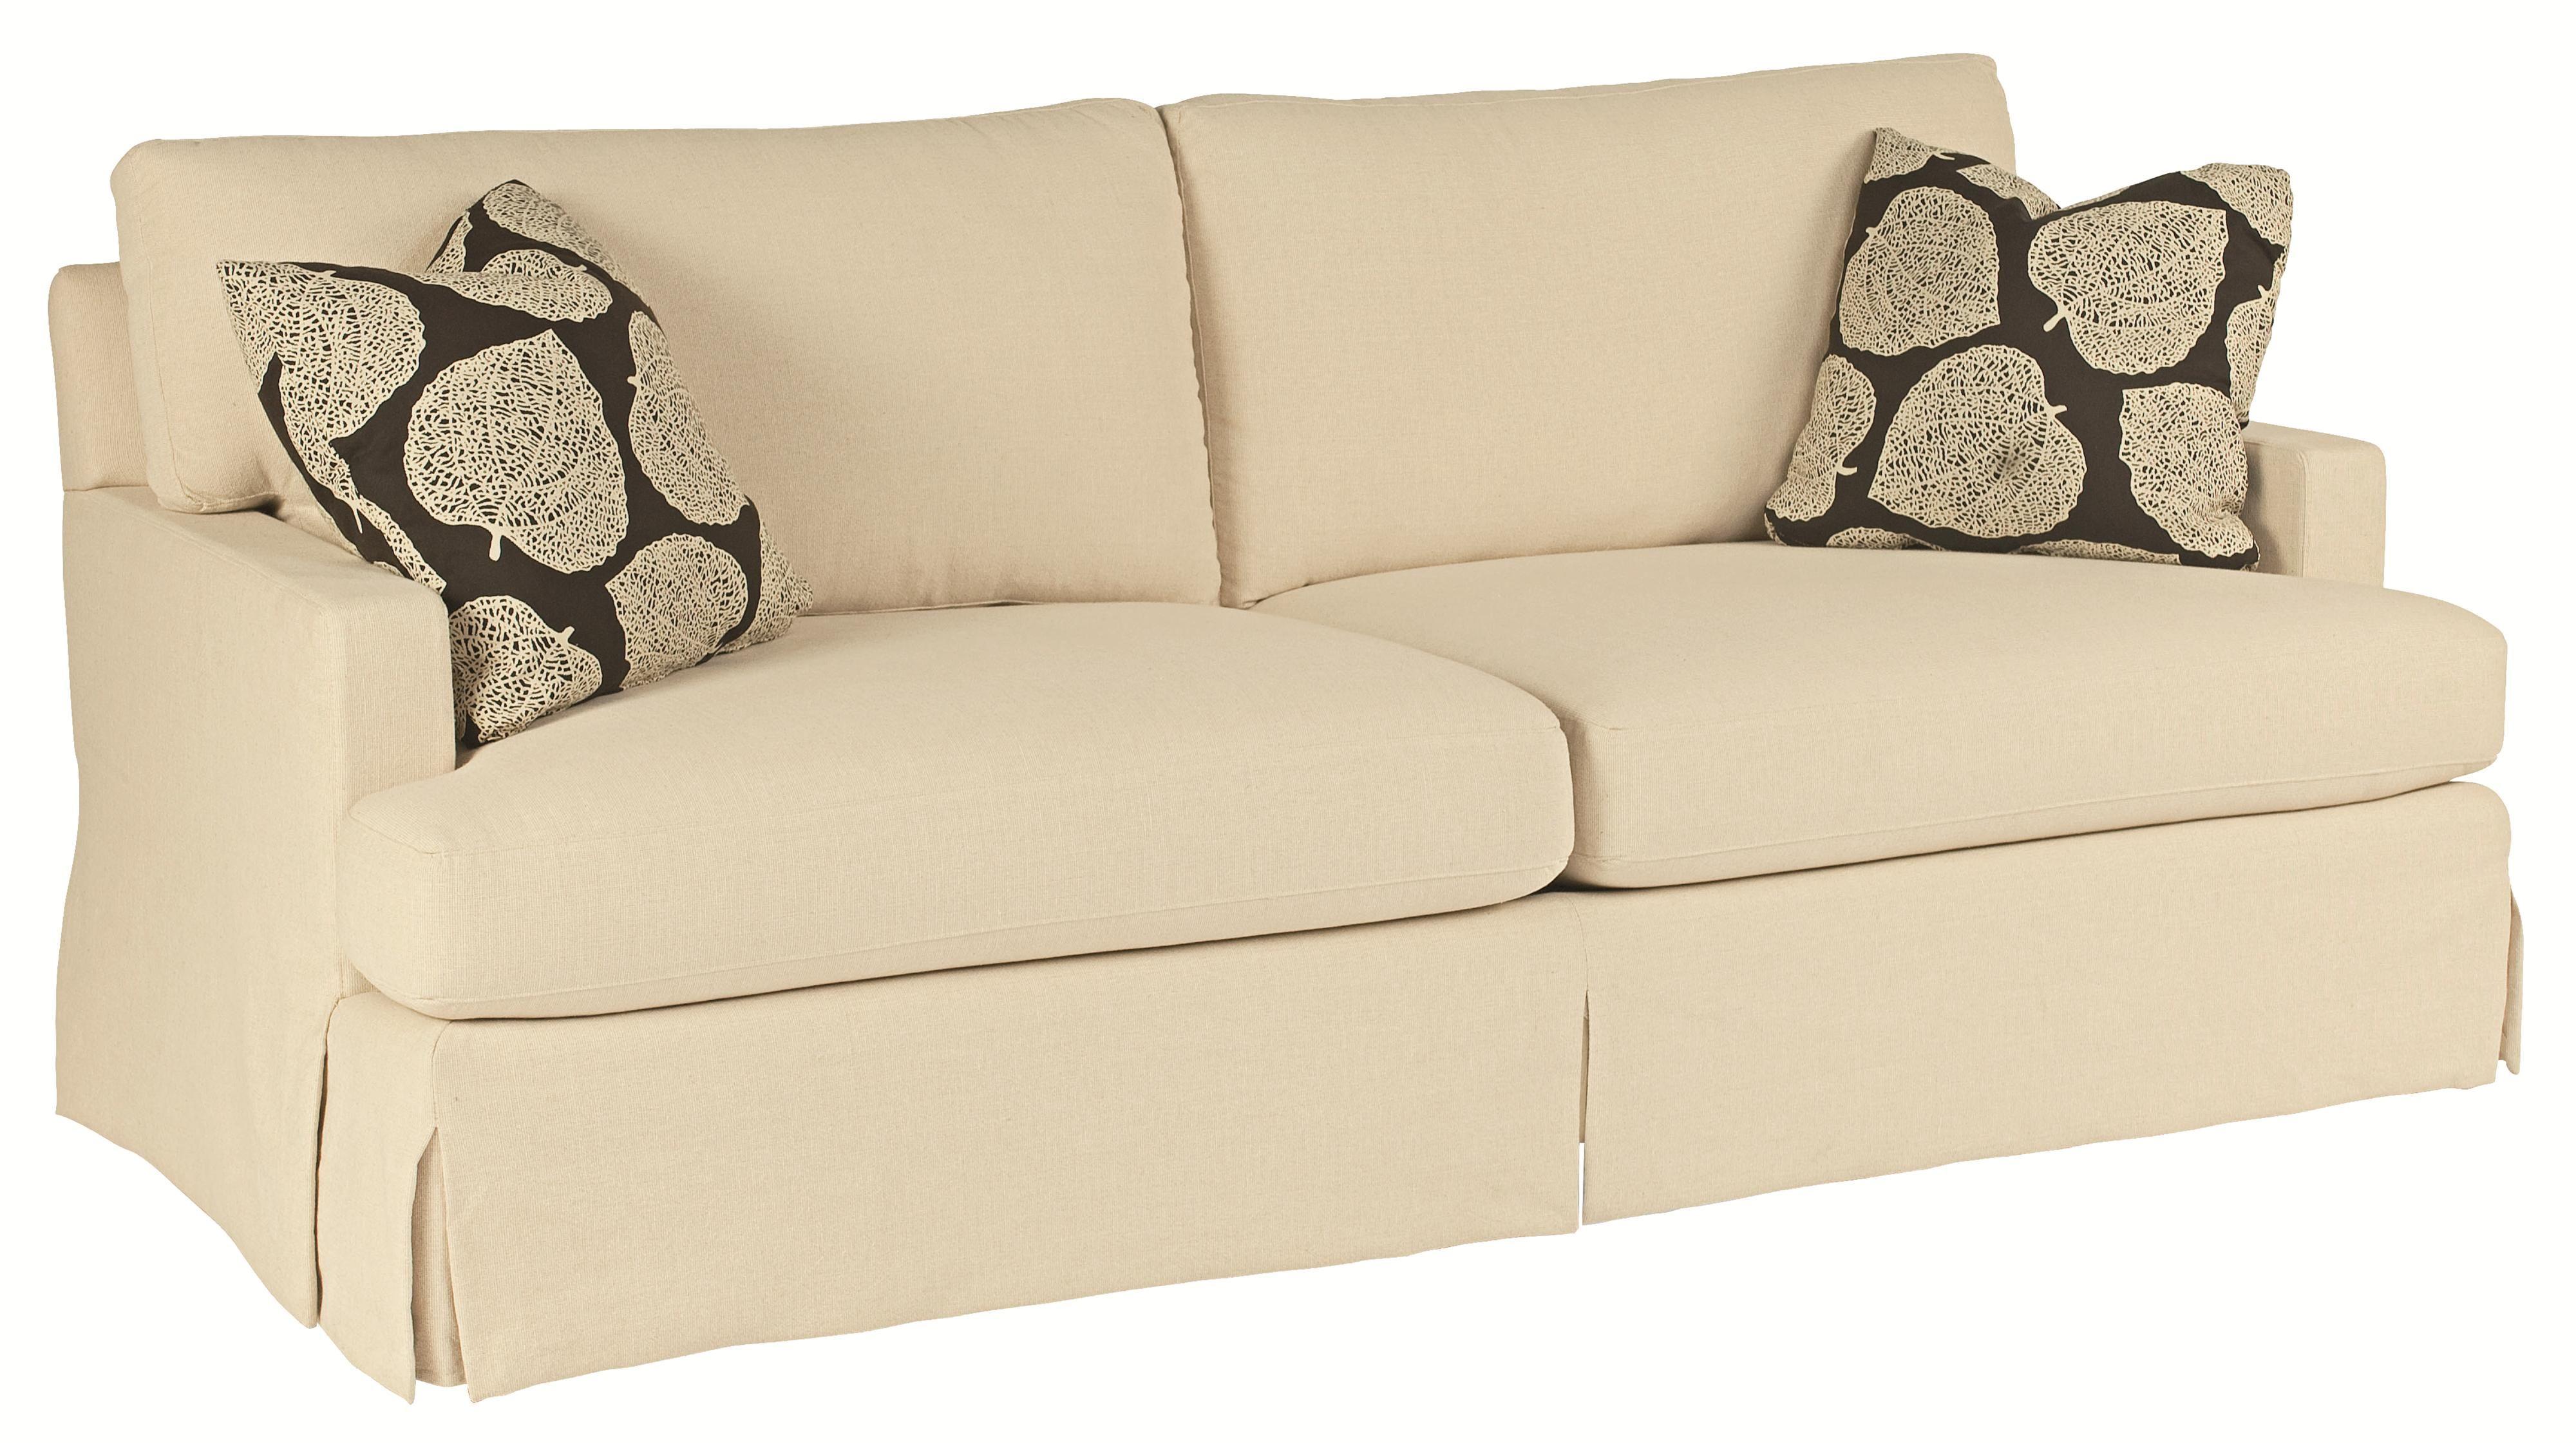 Bernhardt Ryder B628 Fresh and Classic Sofa Sleeper with Smooth